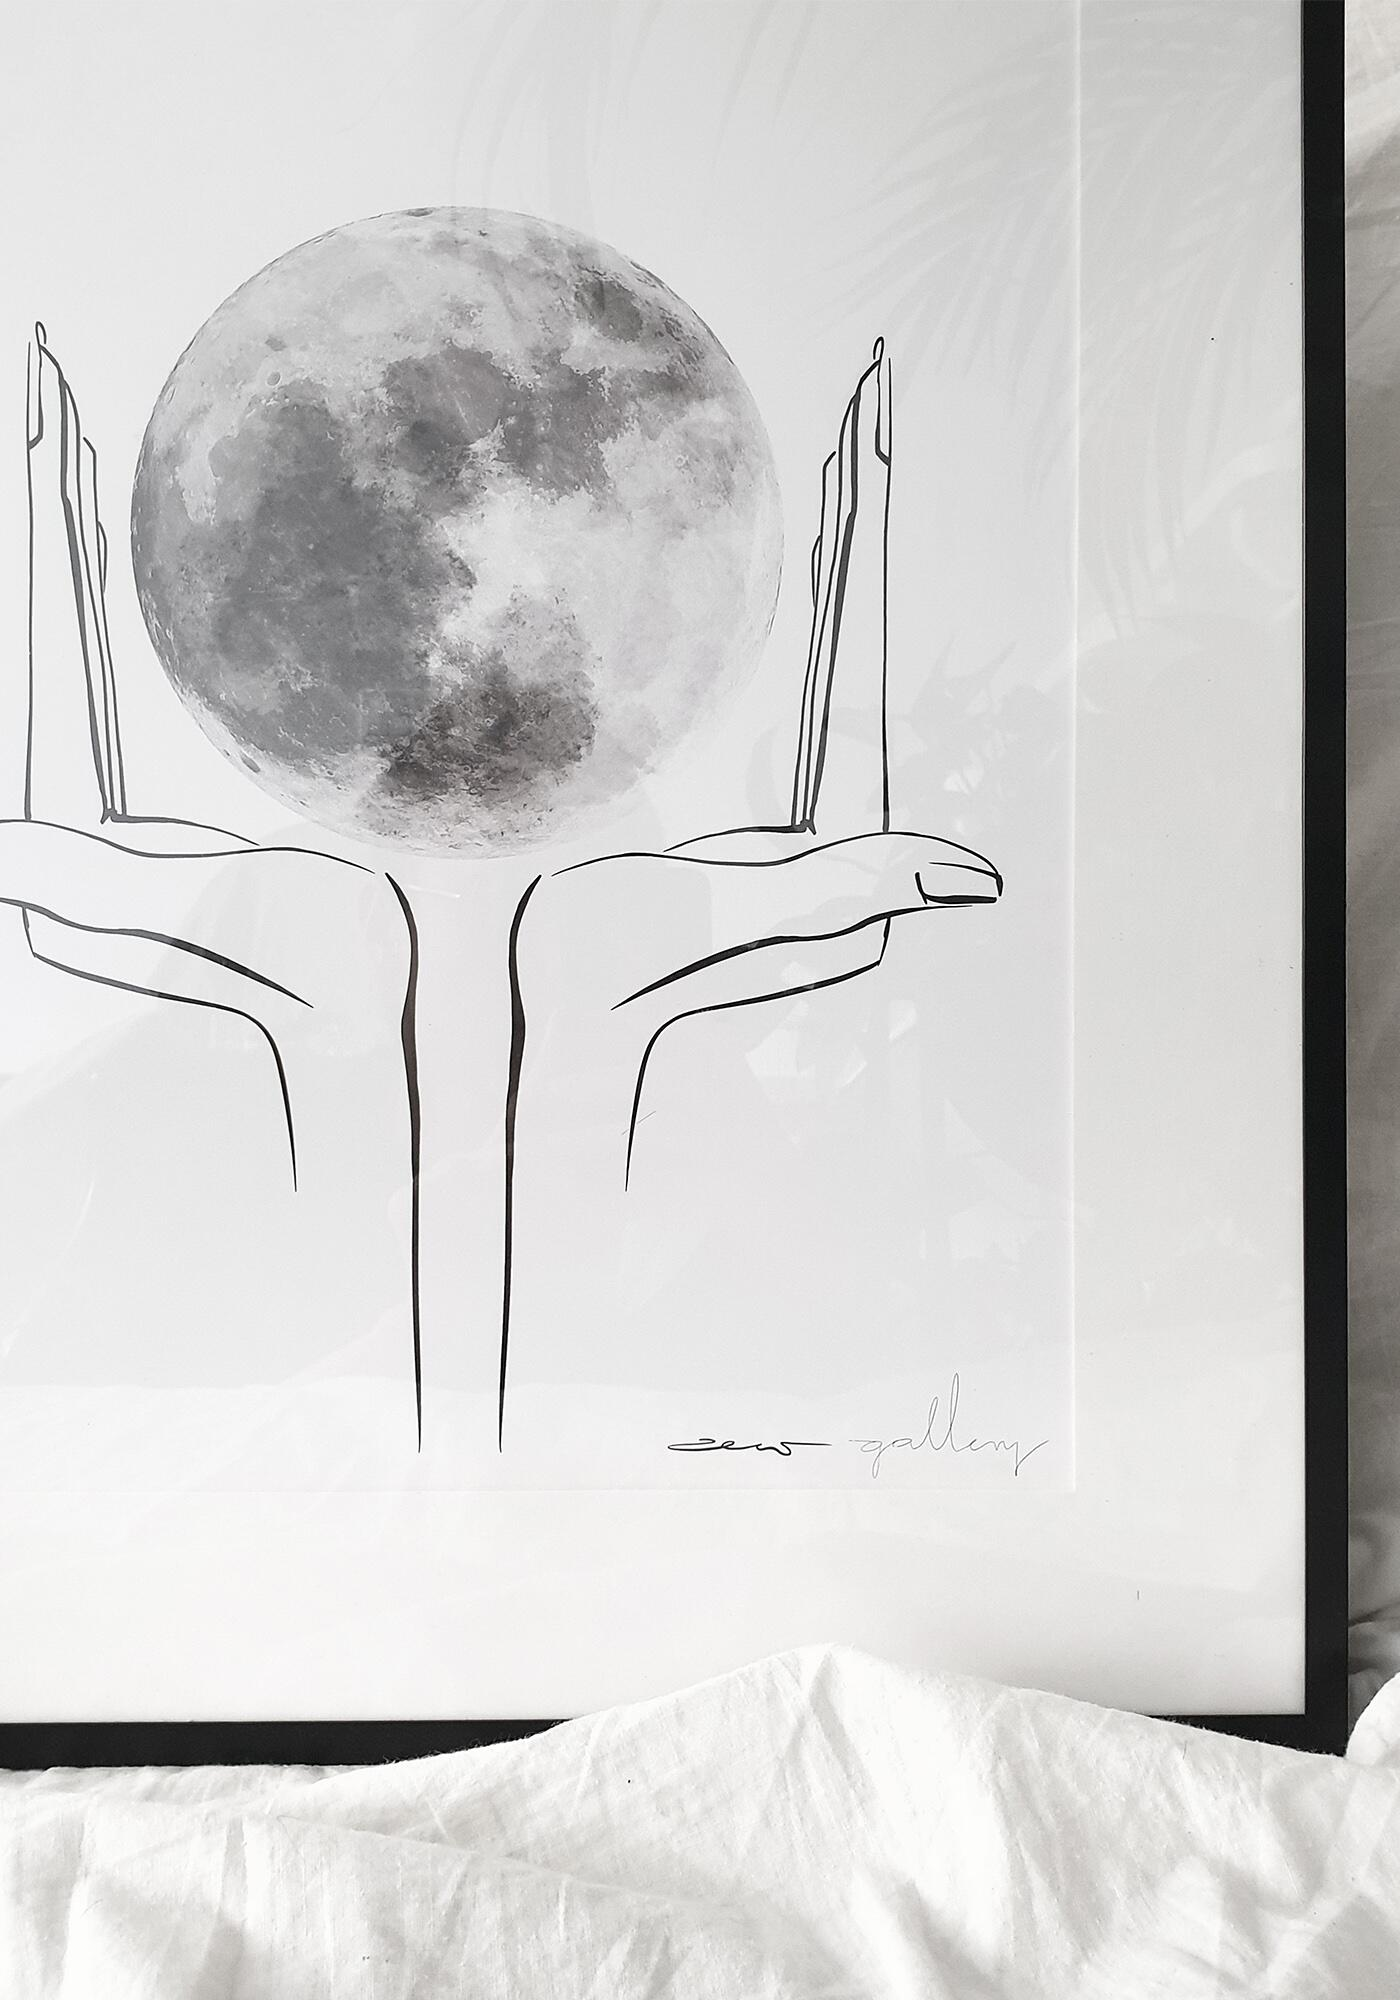 plakat Moon touch | Dotyk Ksieżyca - zew.gallery | JestemSlow.pl